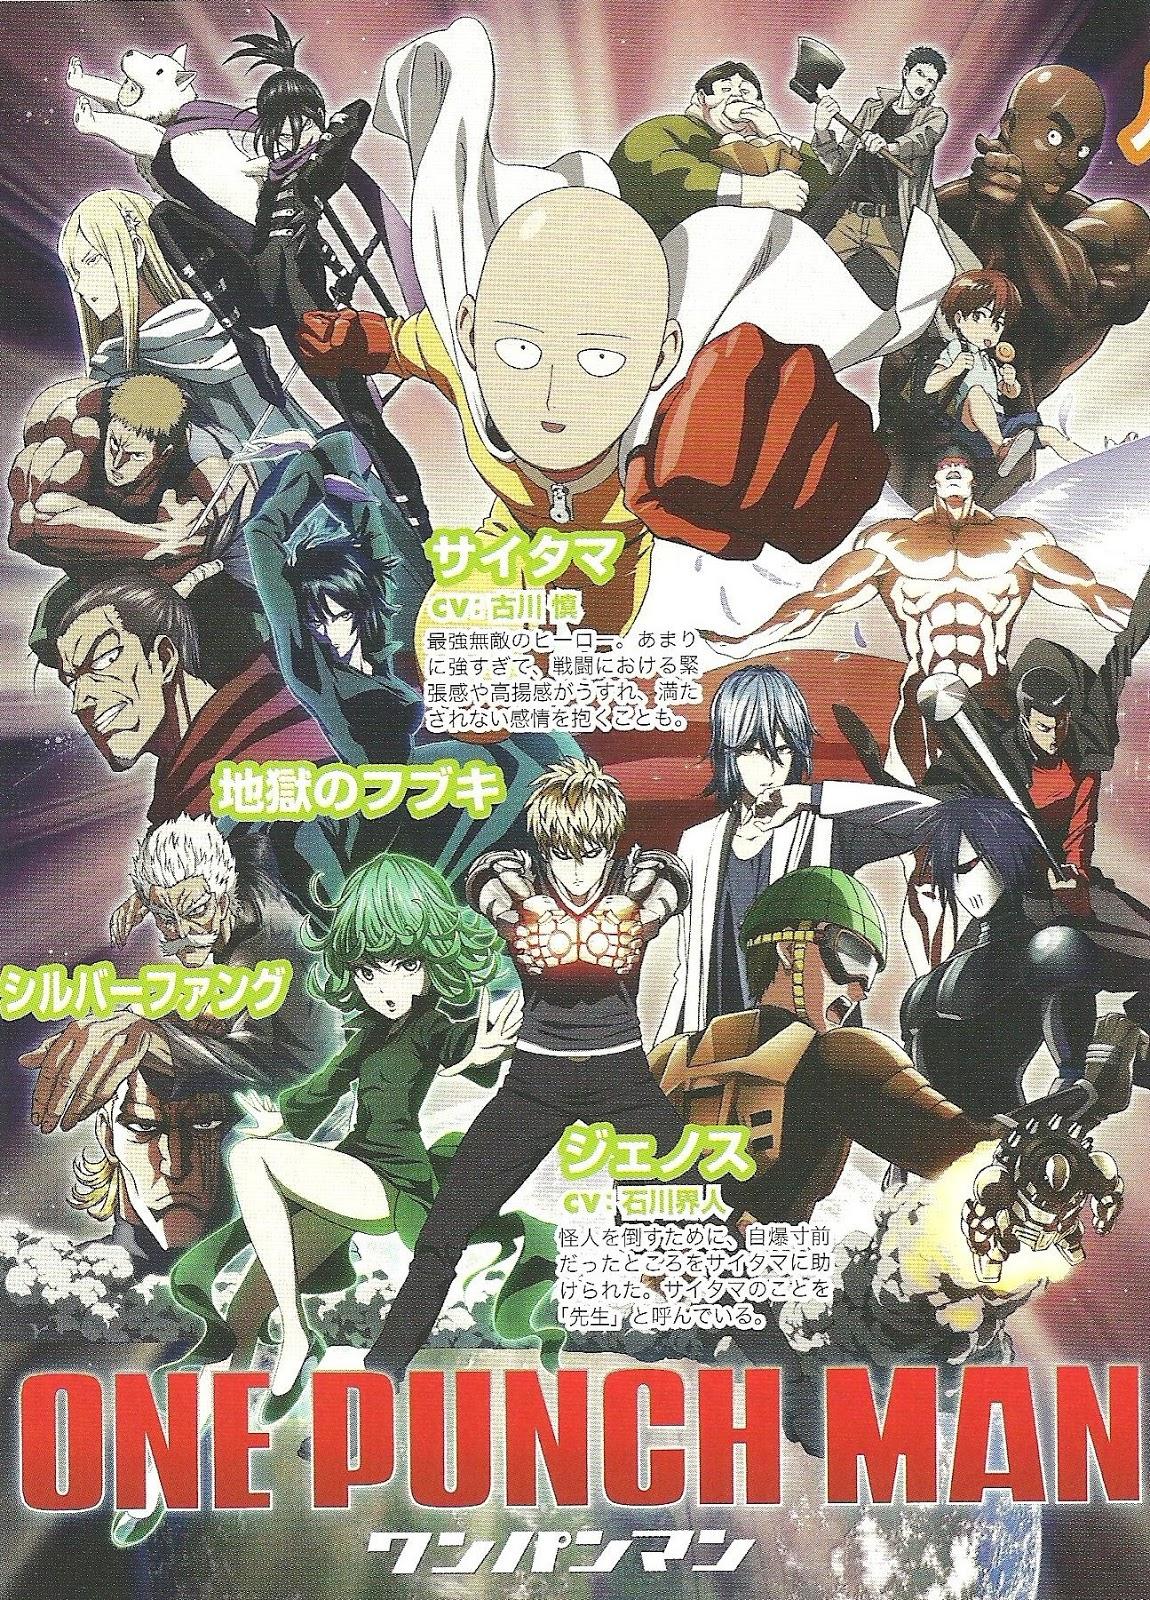 Moonlight Summoner's Anime Sekai: One-Punch Man ワンパンマン